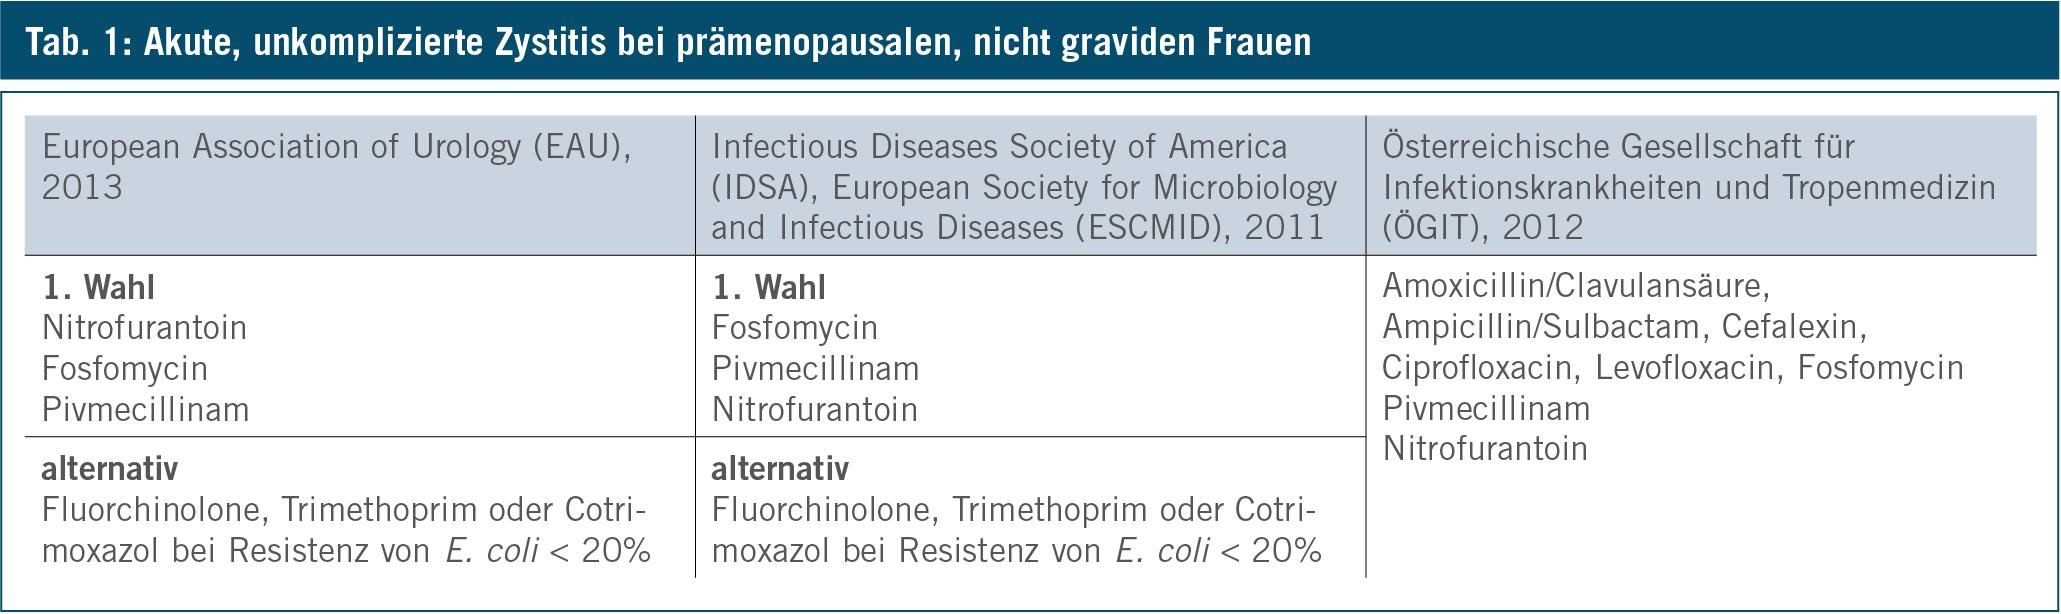 behandlung escherichia coli